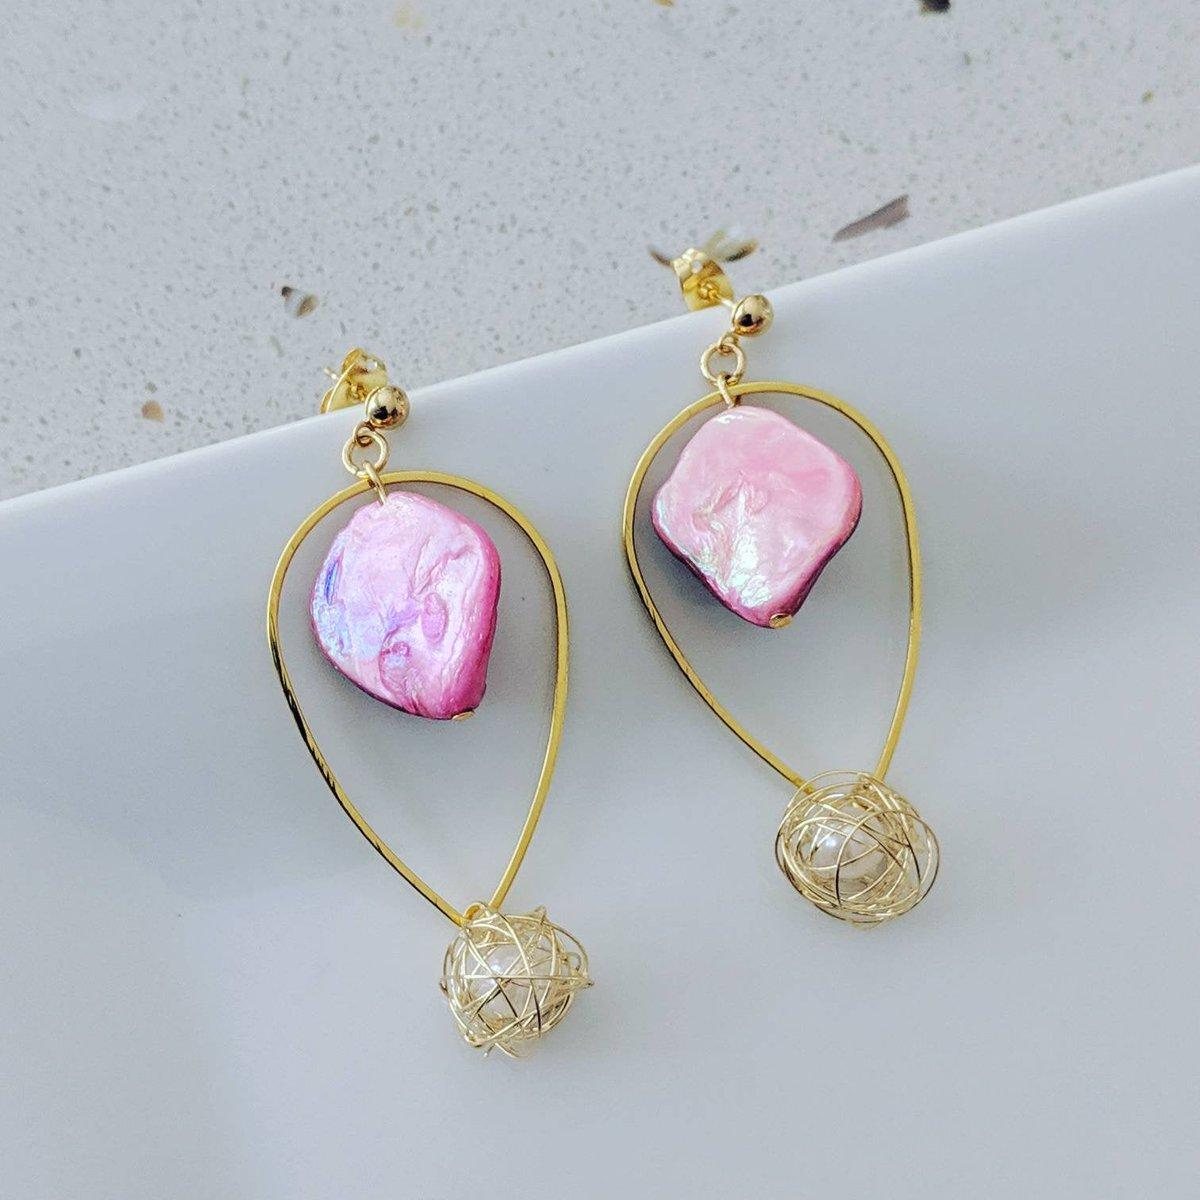 Unique pink seashell with wirewrap pearl, Handmade, Mermaid earring#Gold #Handmade #Earring #Unique #Wire #Black #Pink #White #Mermaid #Oval #Wirewrap #Pearlhttps://www.etsy.com/listing/710220528/unique-pink-seashell-with-wirewrap-pearl?utm_source=poster&utm_medium=api&utm_campaign=api…